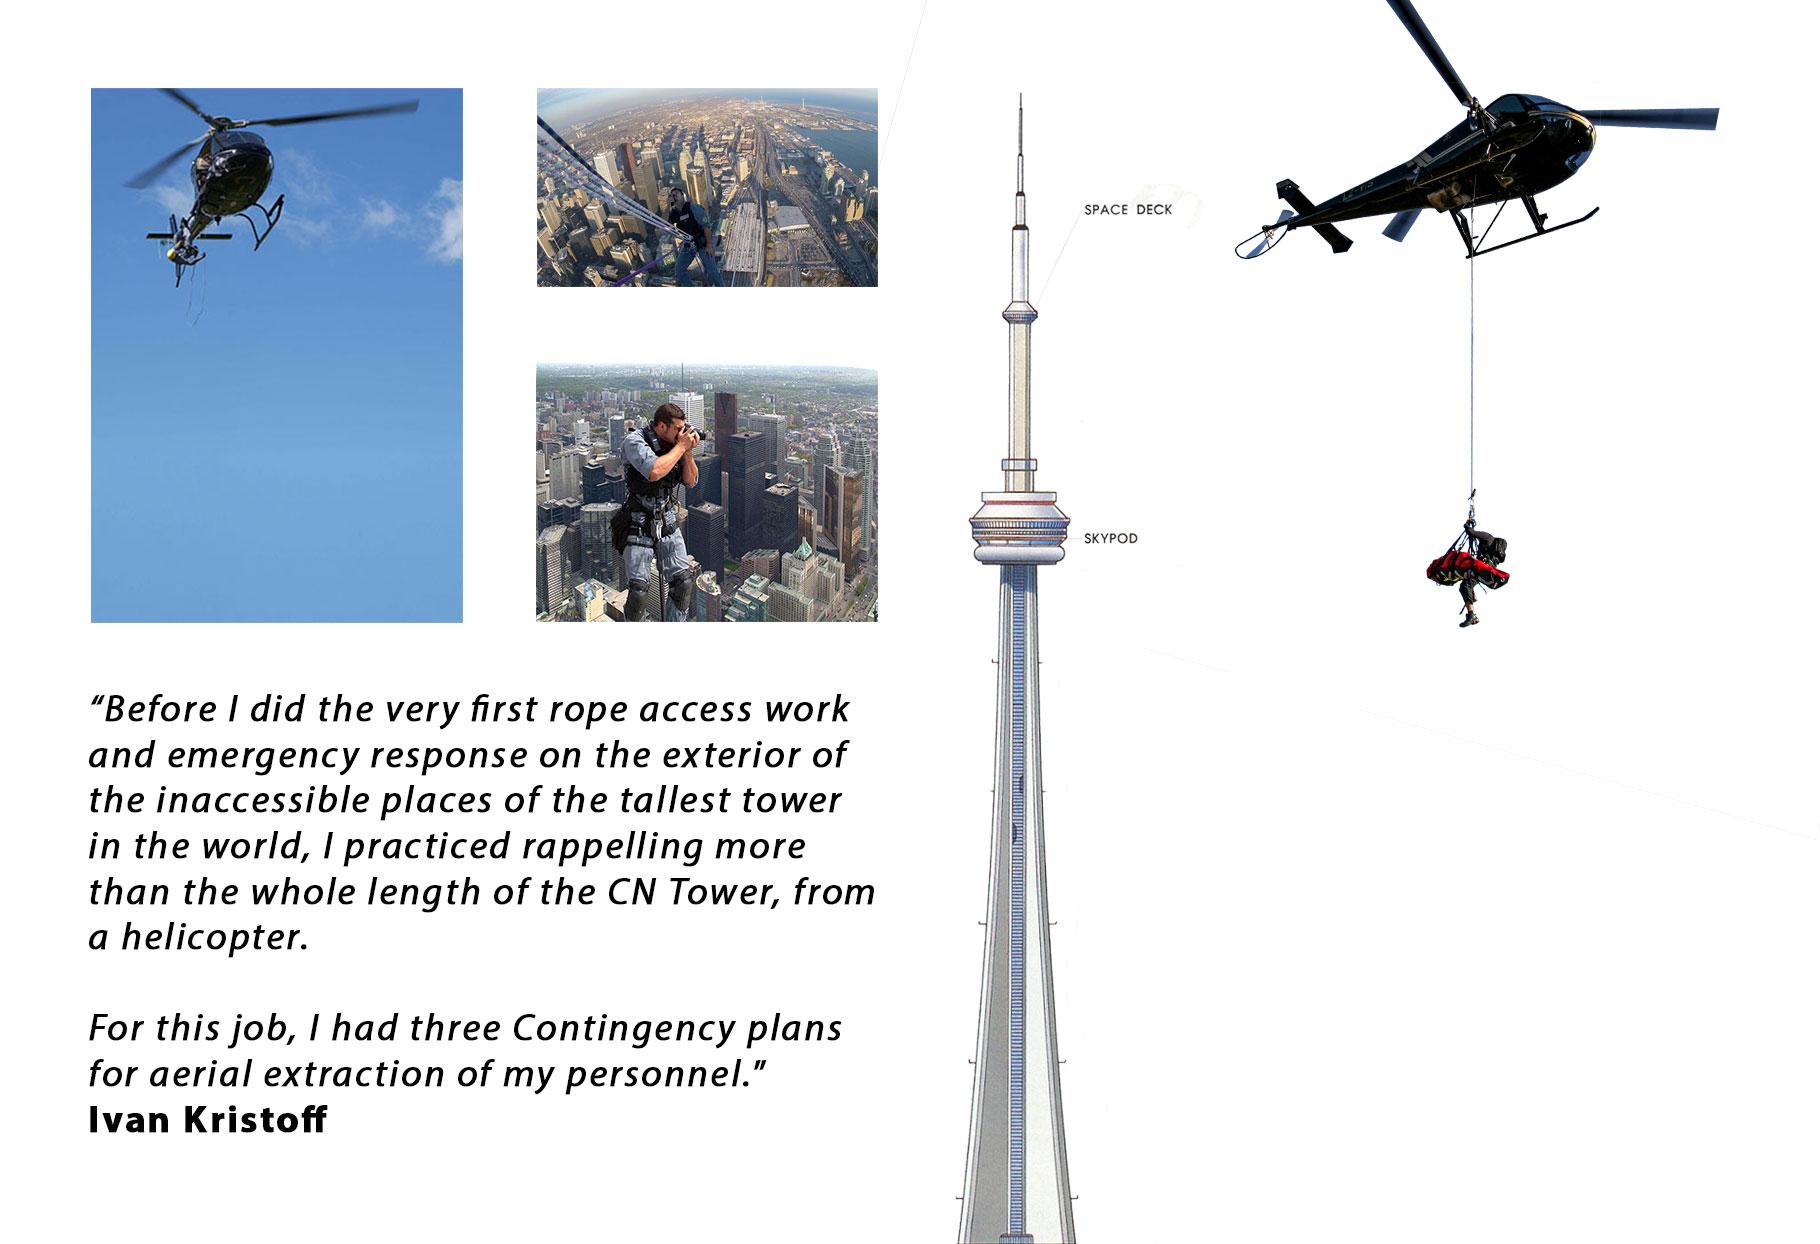 Solo free climber Ivan Kristoff ahd